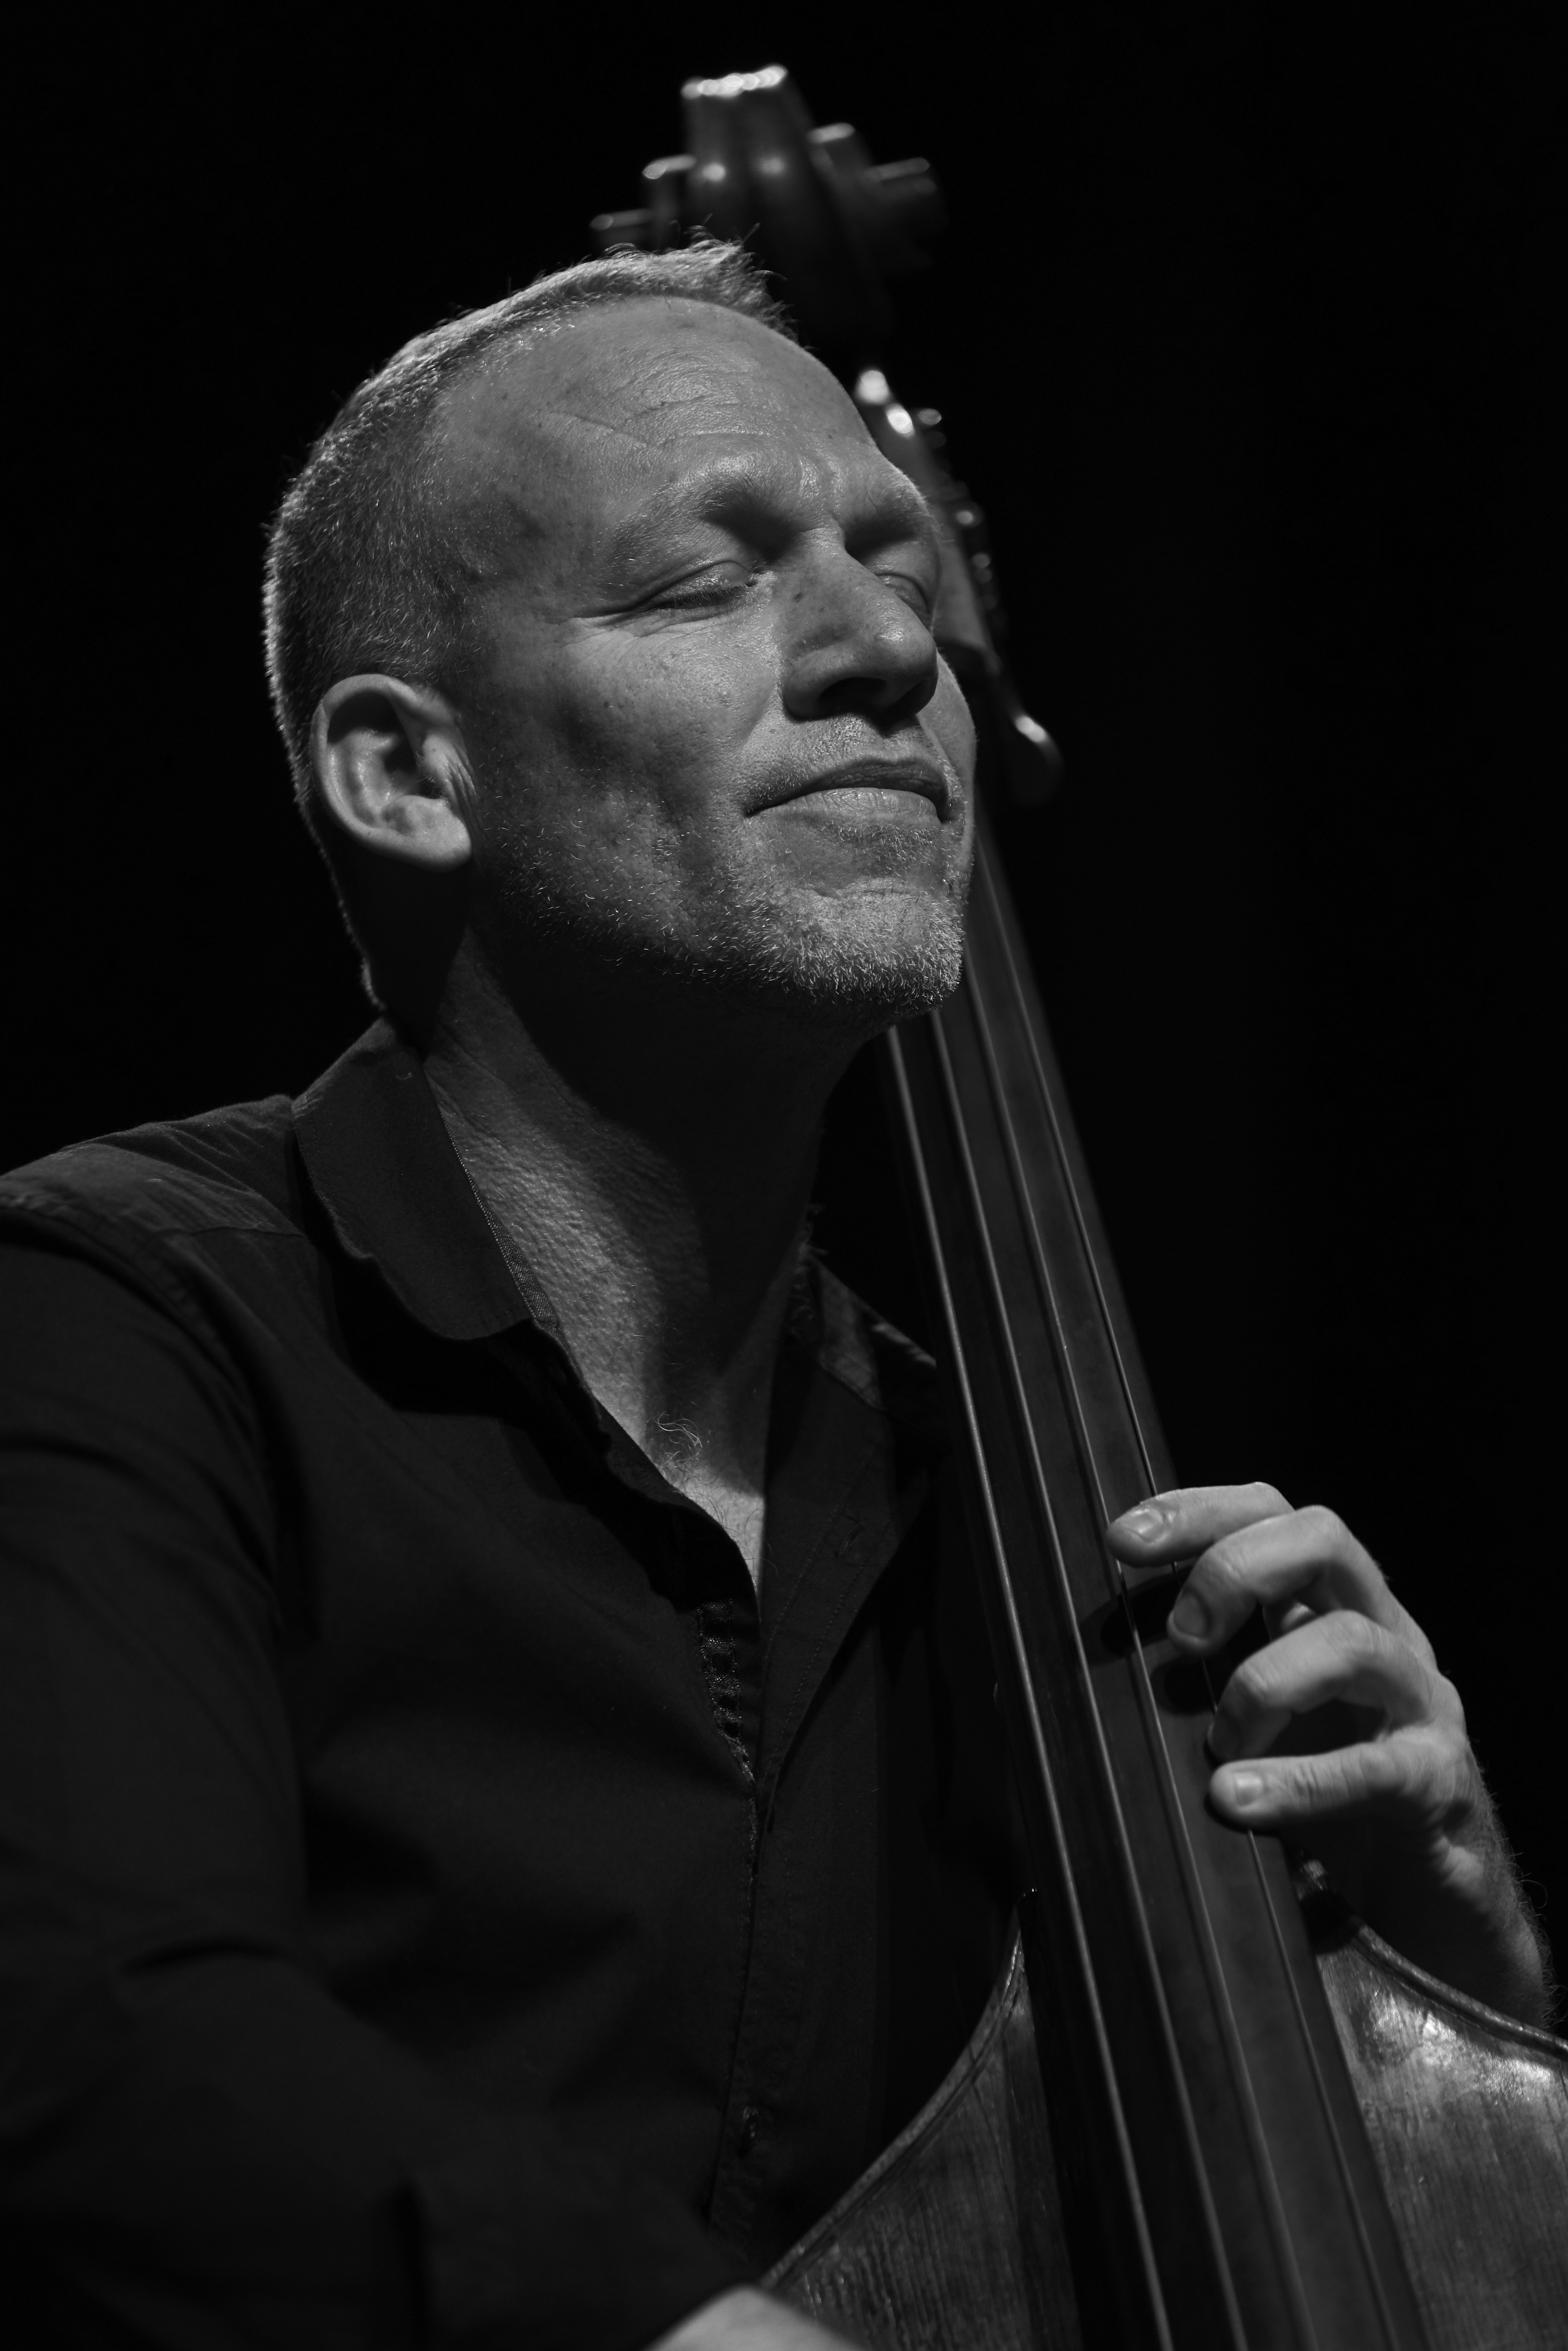 Avishai Cohen Trio concert in Chelles near Paris France on May 2019